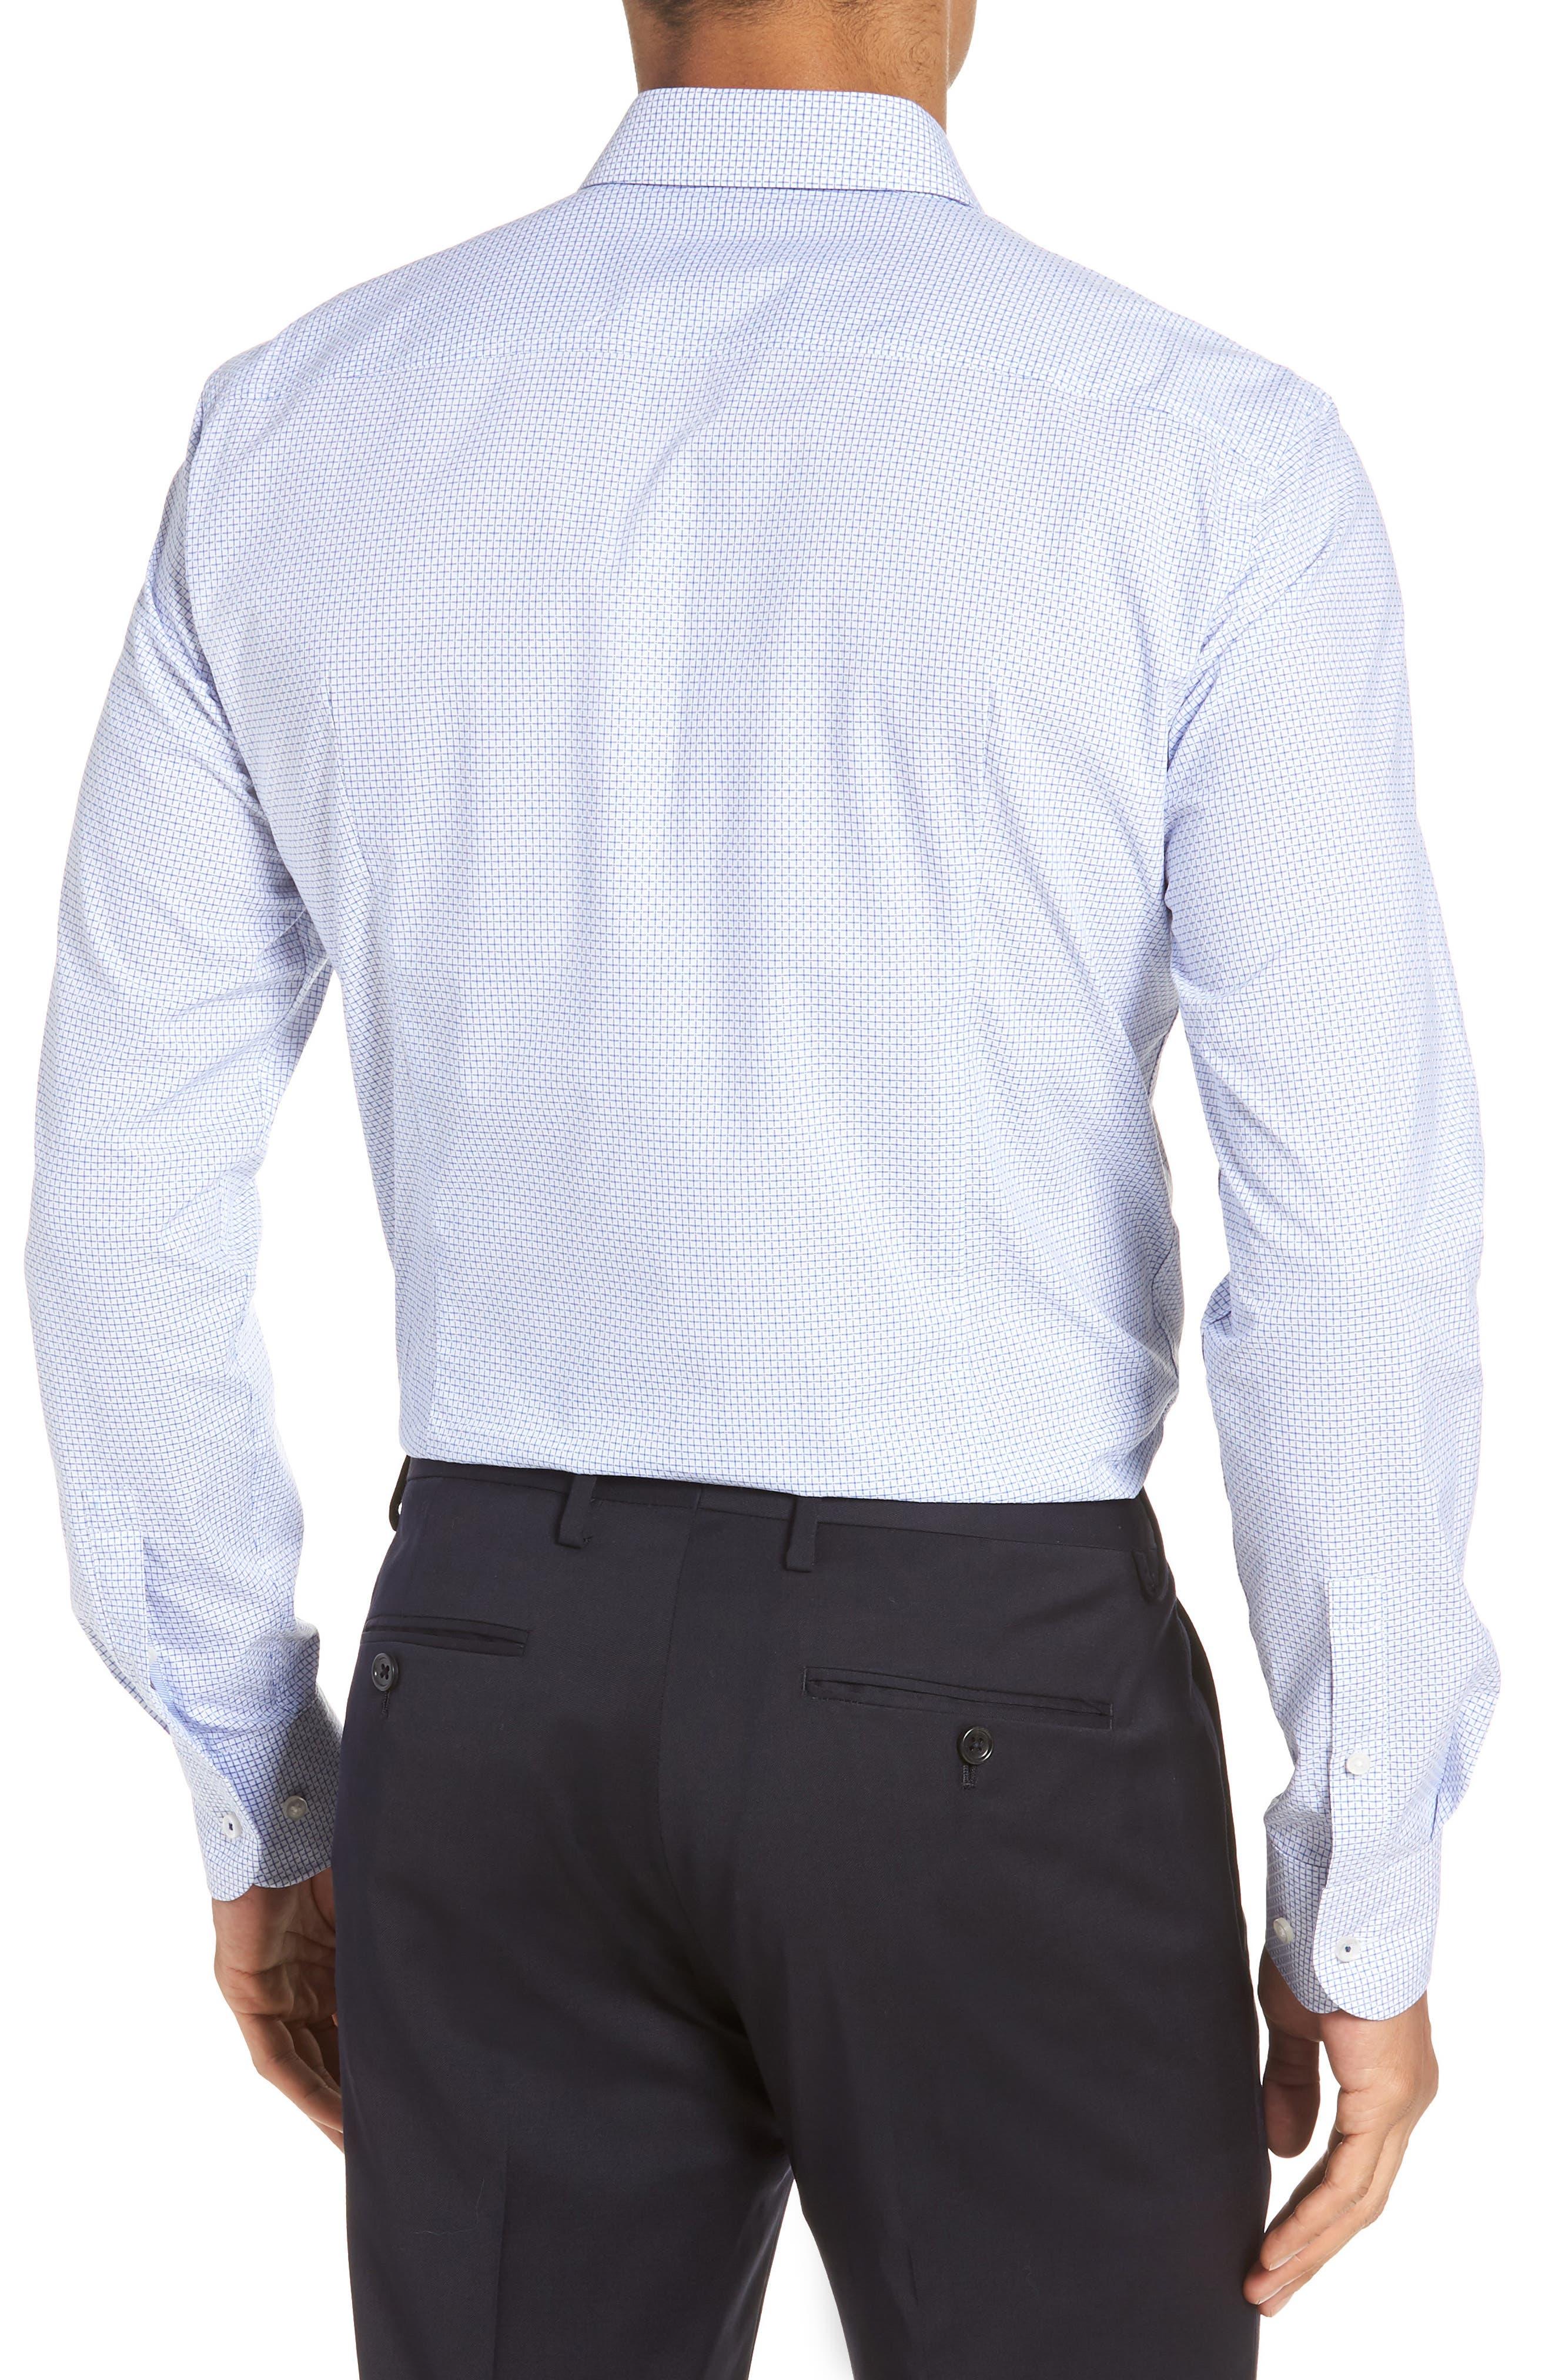 Jesse Slim Fit Check Dress Shirt,                             Alternate thumbnail 3, color,                             Blue